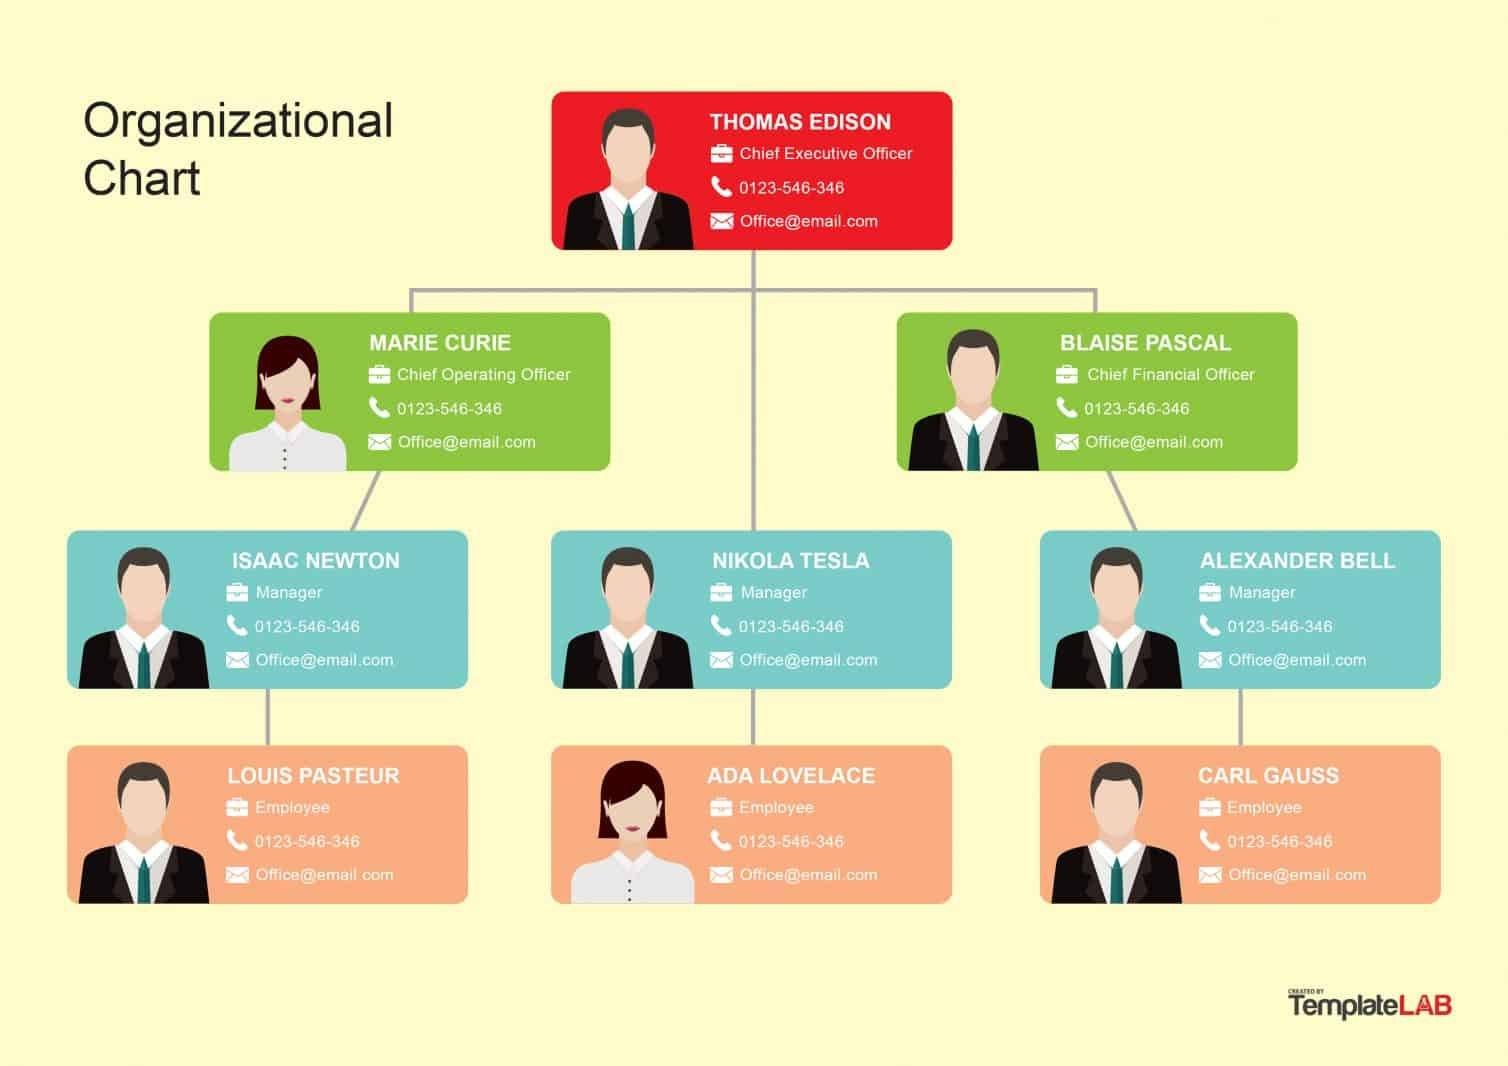 Organizational Chart Templates Word Excel Powerpoint Regarding Microsoft Powerpoint Org Chart Template